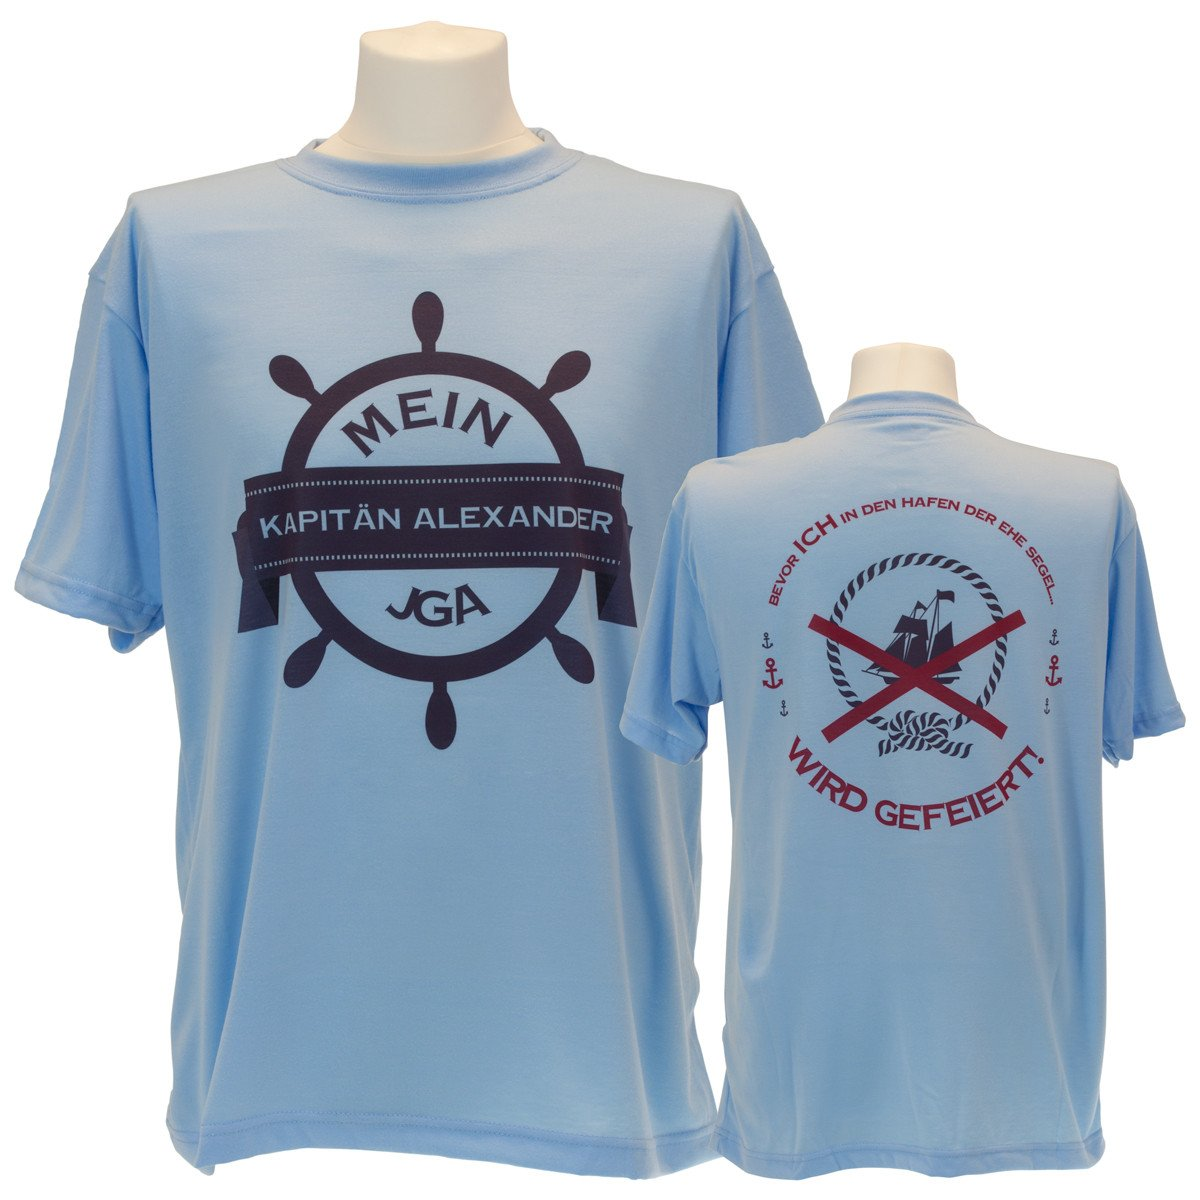 T Shirt Junggesellenabschied für Männer